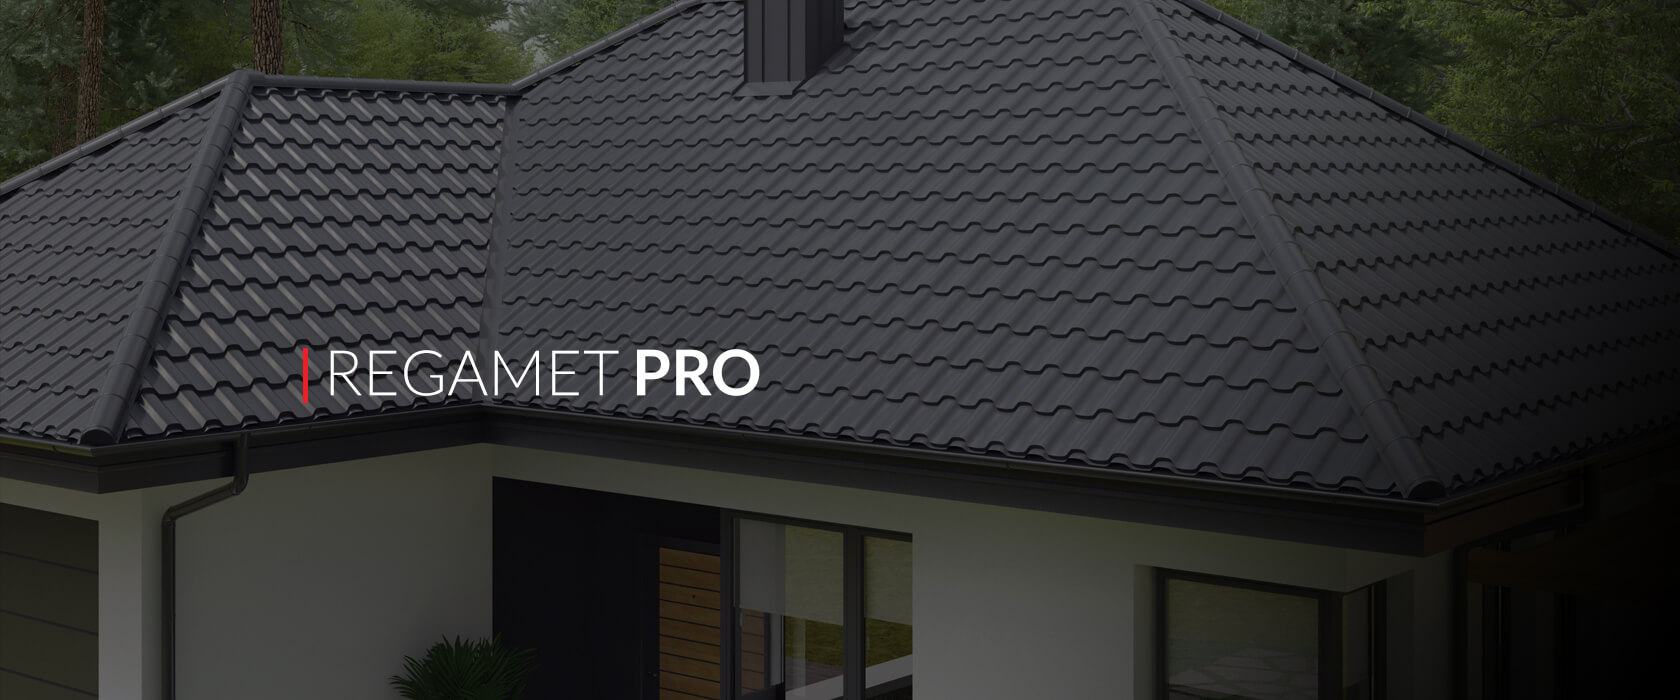 Regamet - Profesjonalne pokrycia dachowe